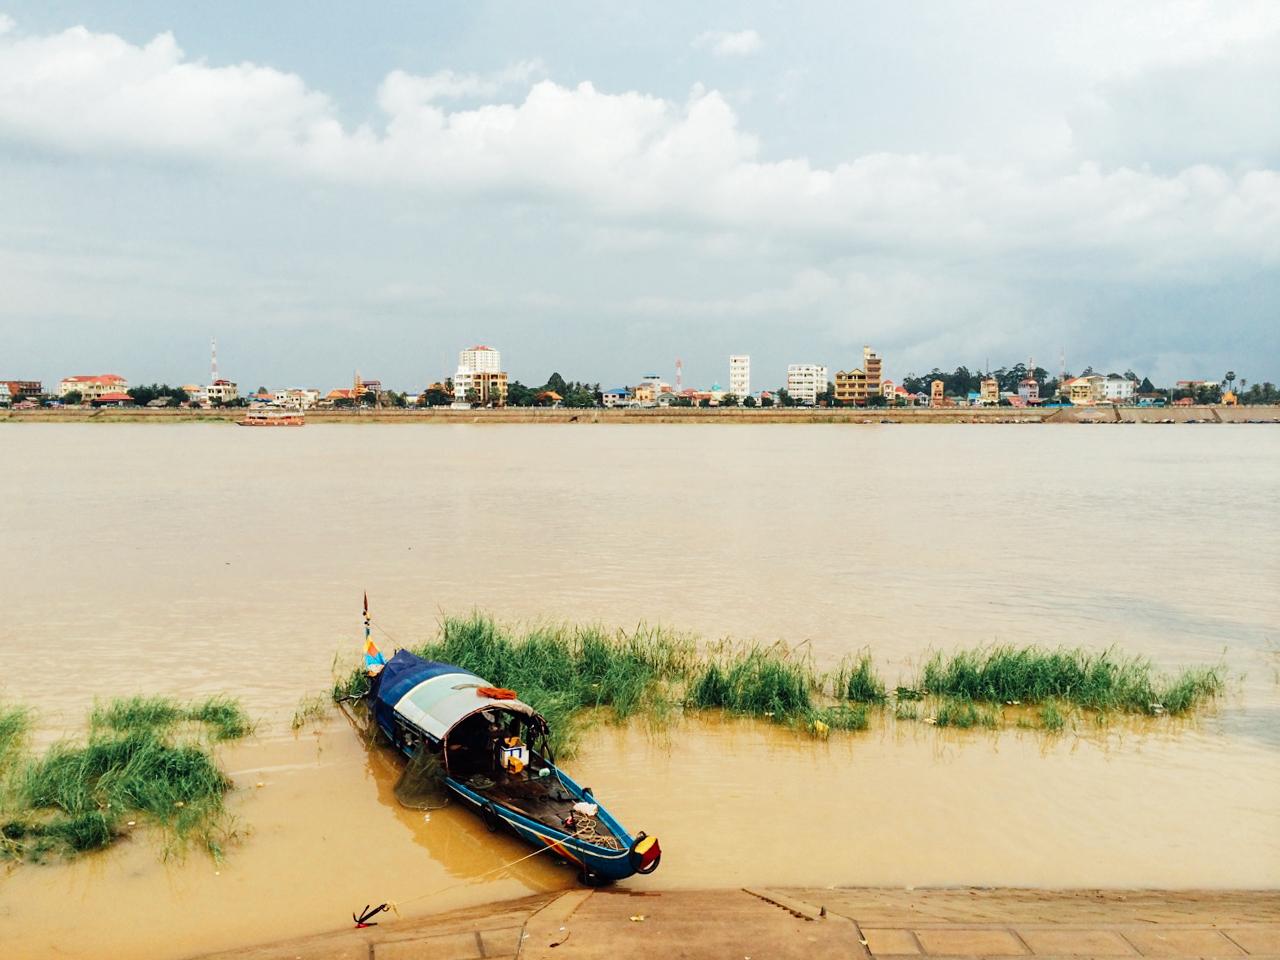 Путешествие по Камбодже: Место слияния Тонле Сап с Меконгом